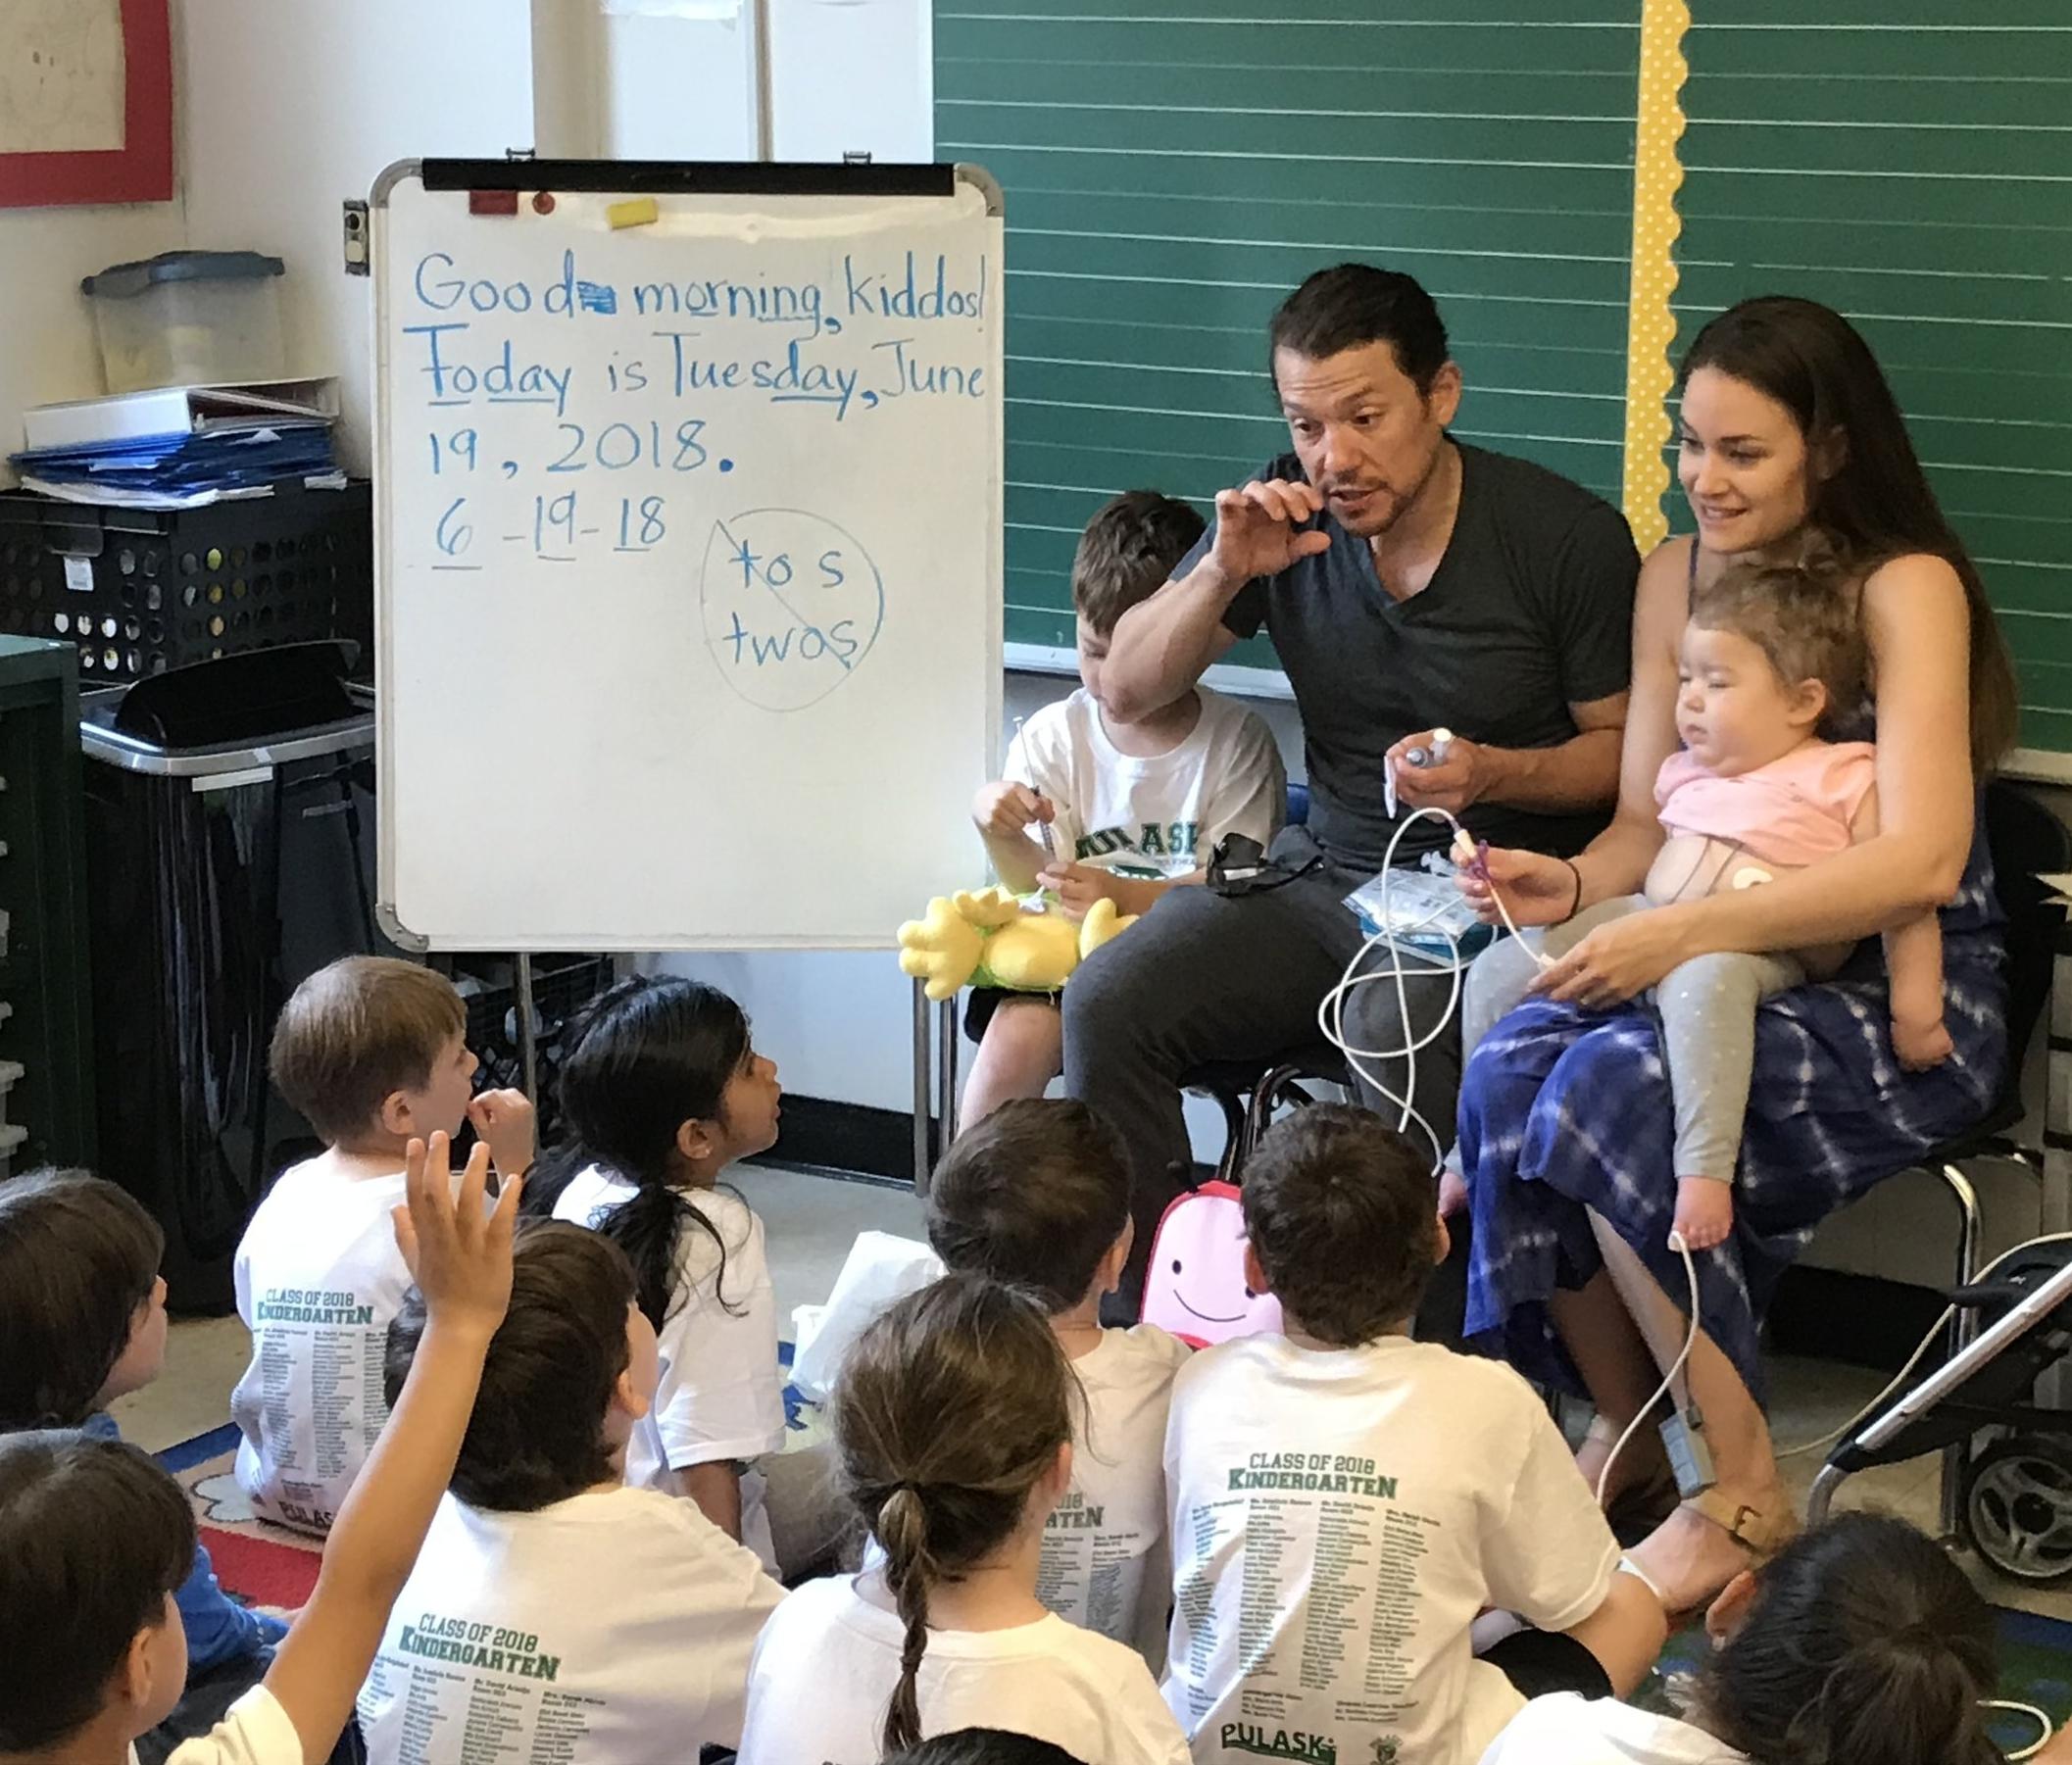 Epilepsy 101: the Kindergarten edition